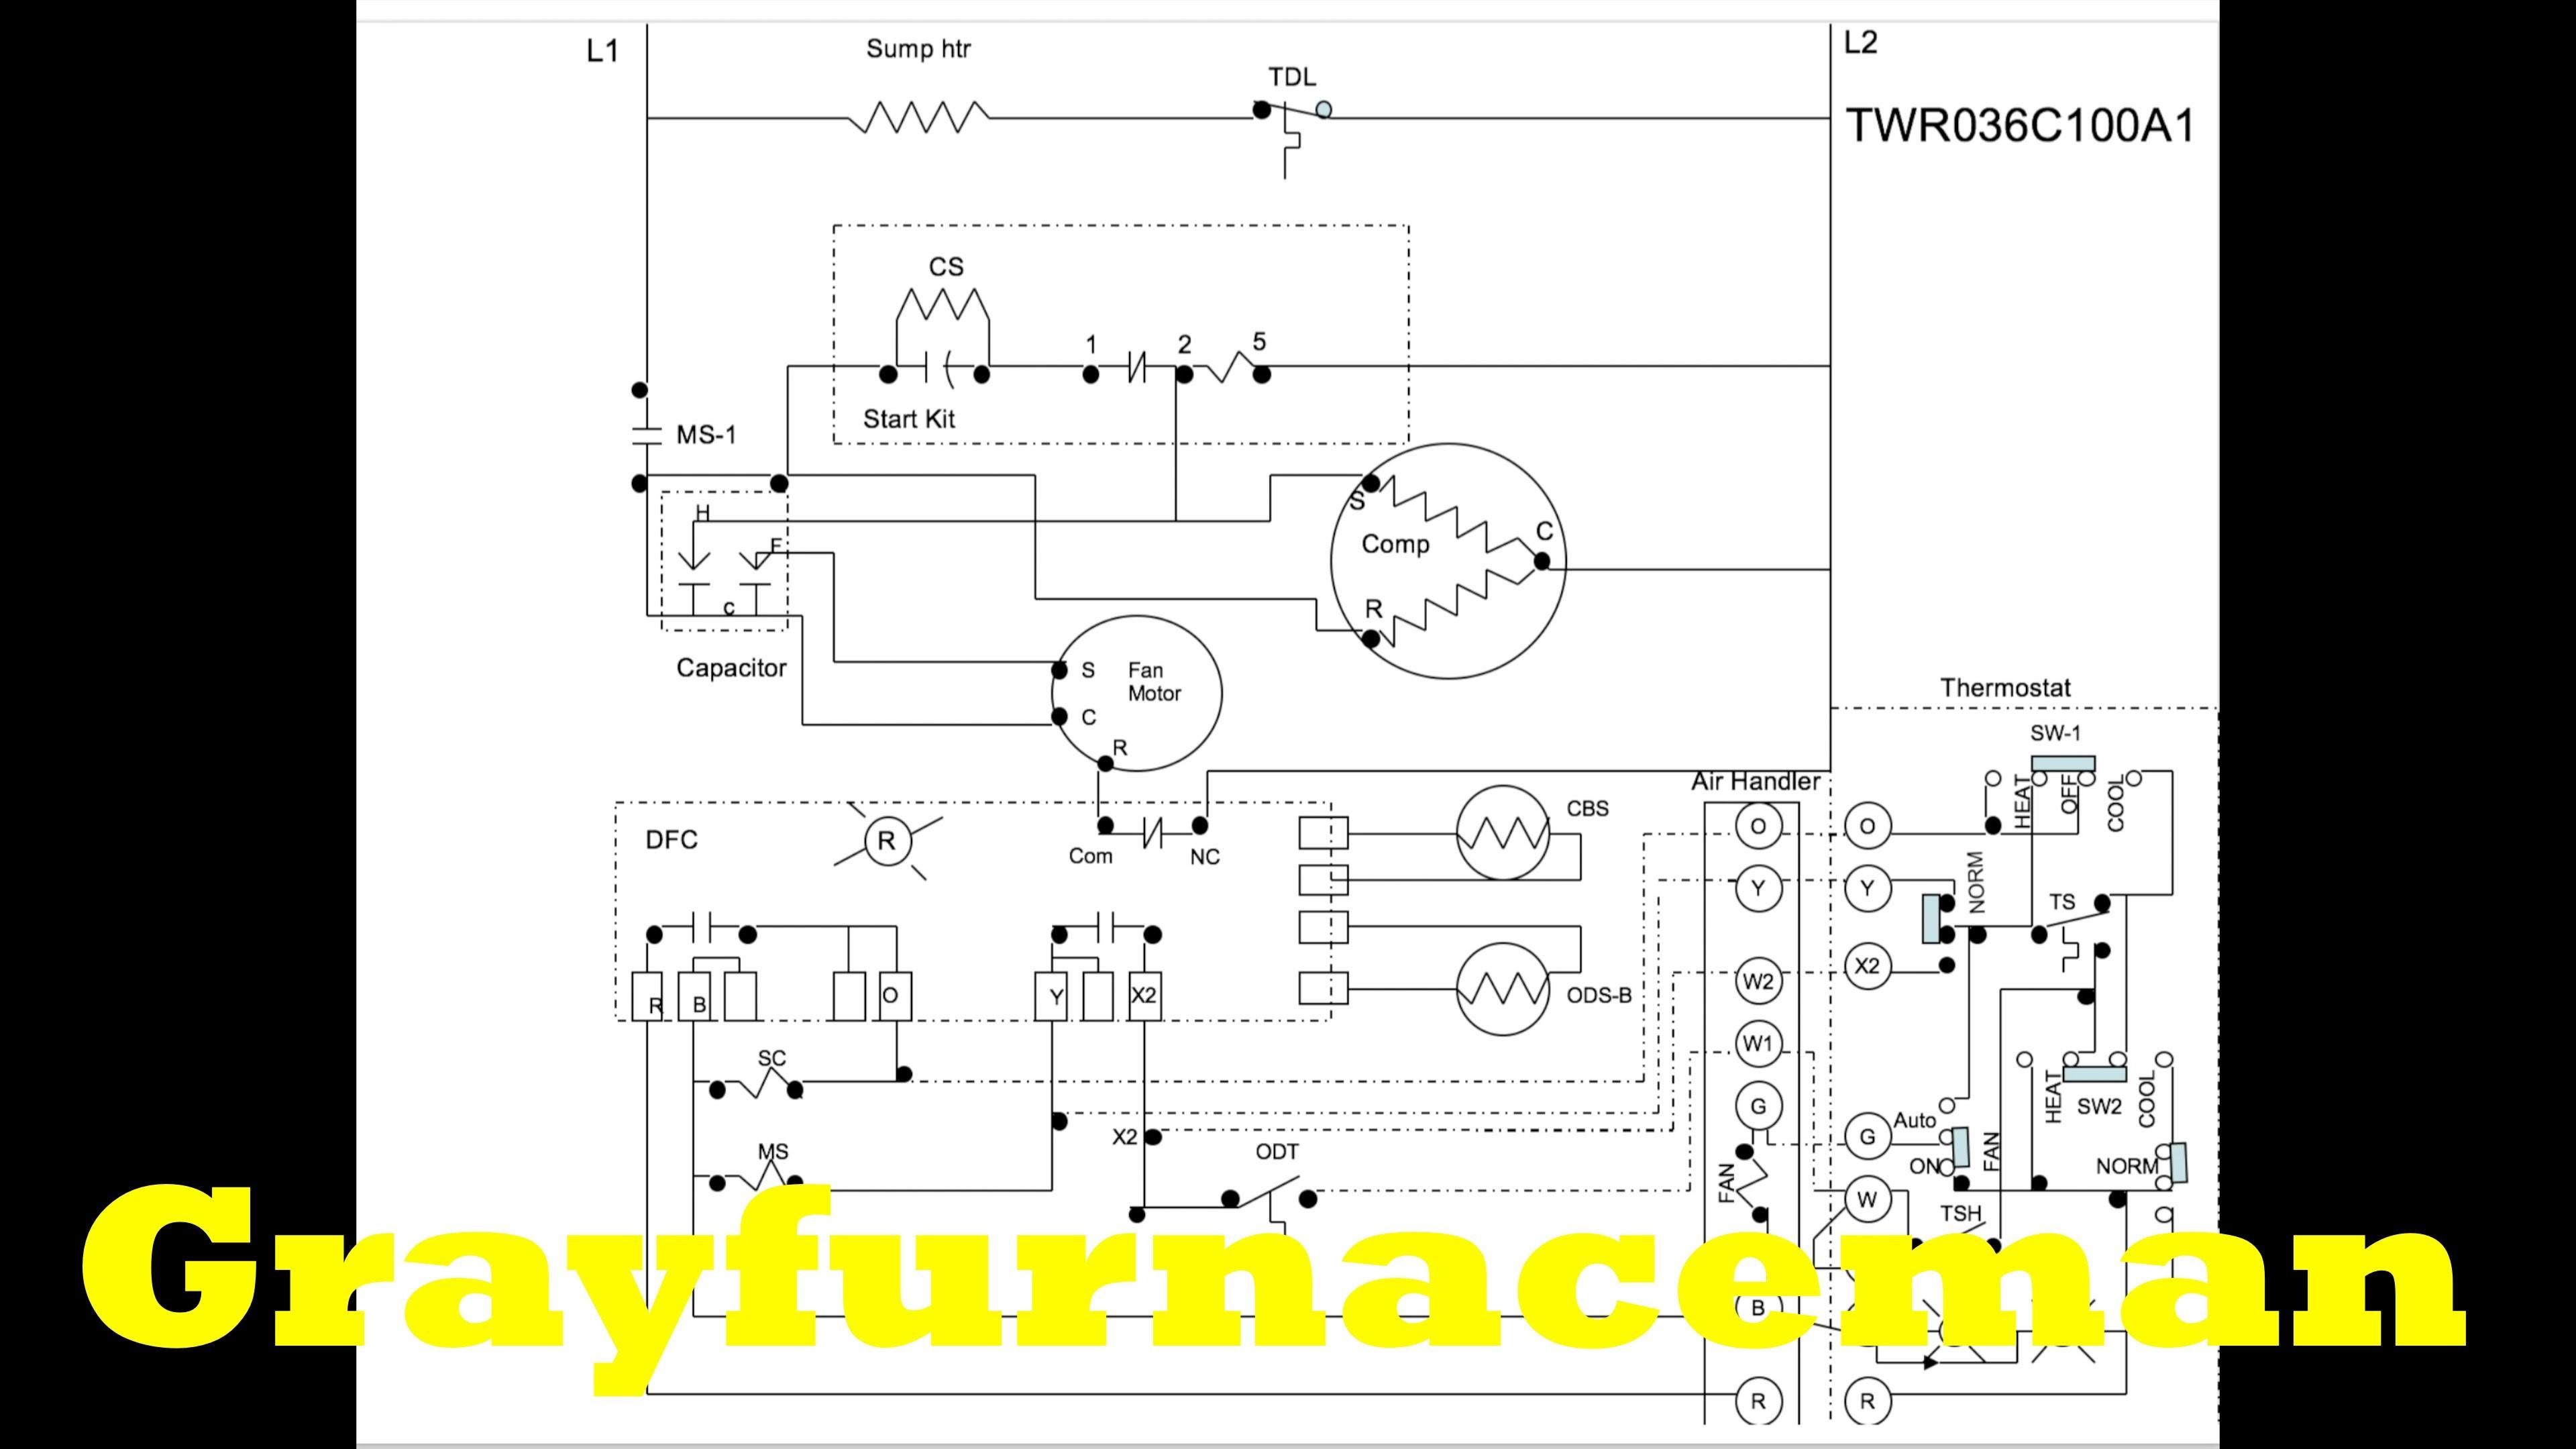 Heat Pump Wiring Diagrams Carrier Wiring Diagrams Blurts Of Heat Pump Wiring Diagrams